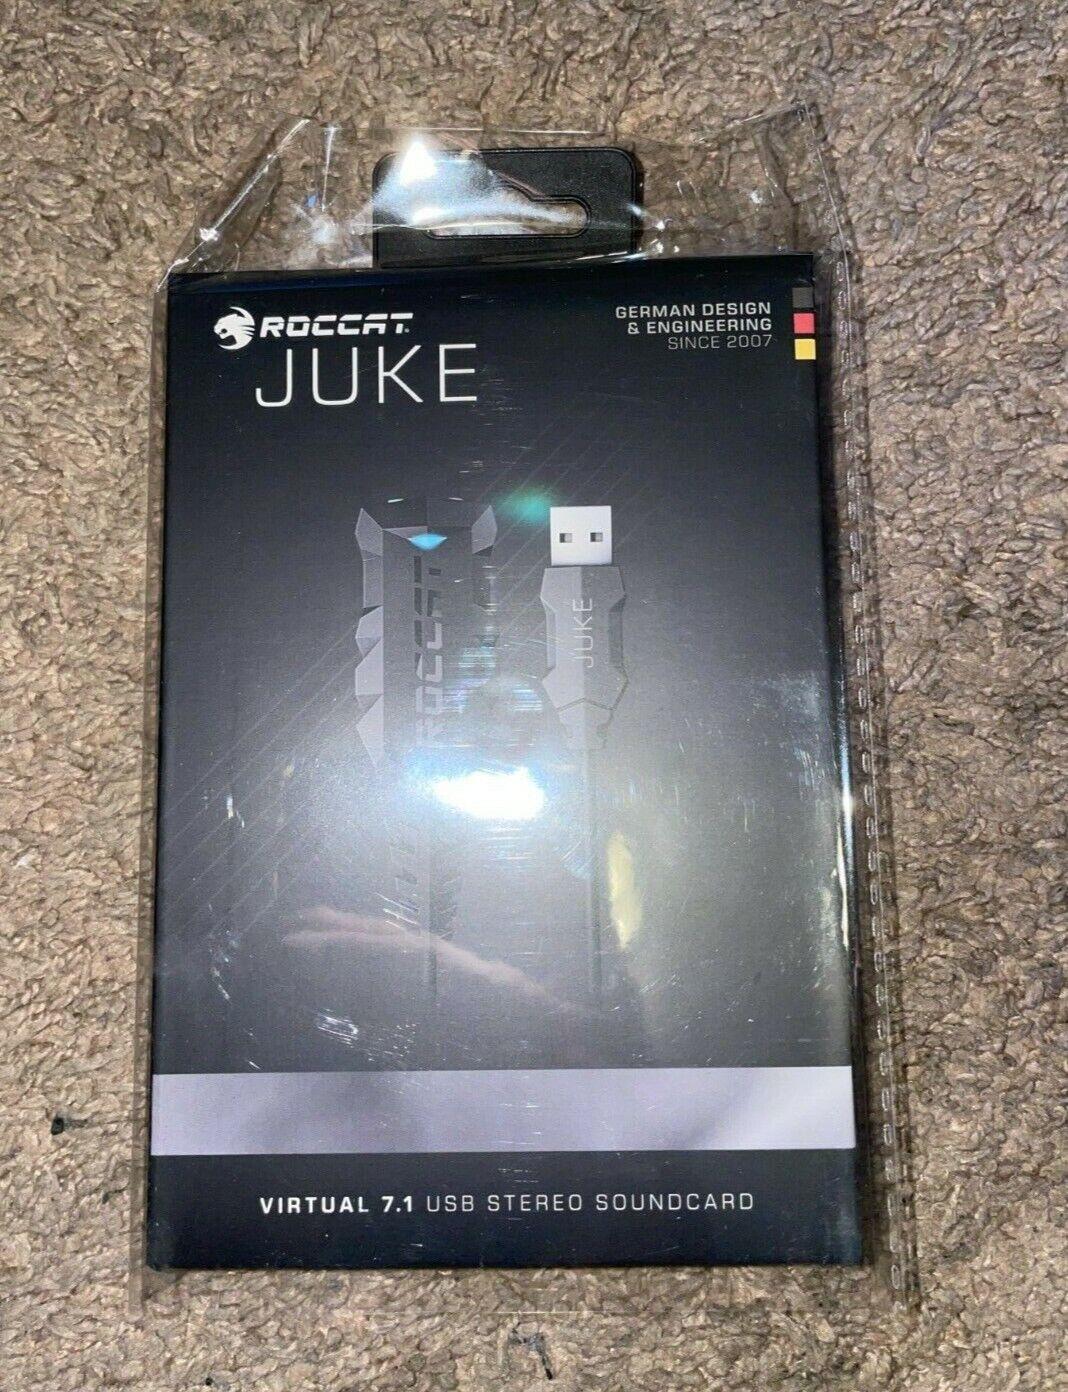 Roccat Juke Virtual 7 1 Usb Stereo External Sound Card For Sale Online Ebay